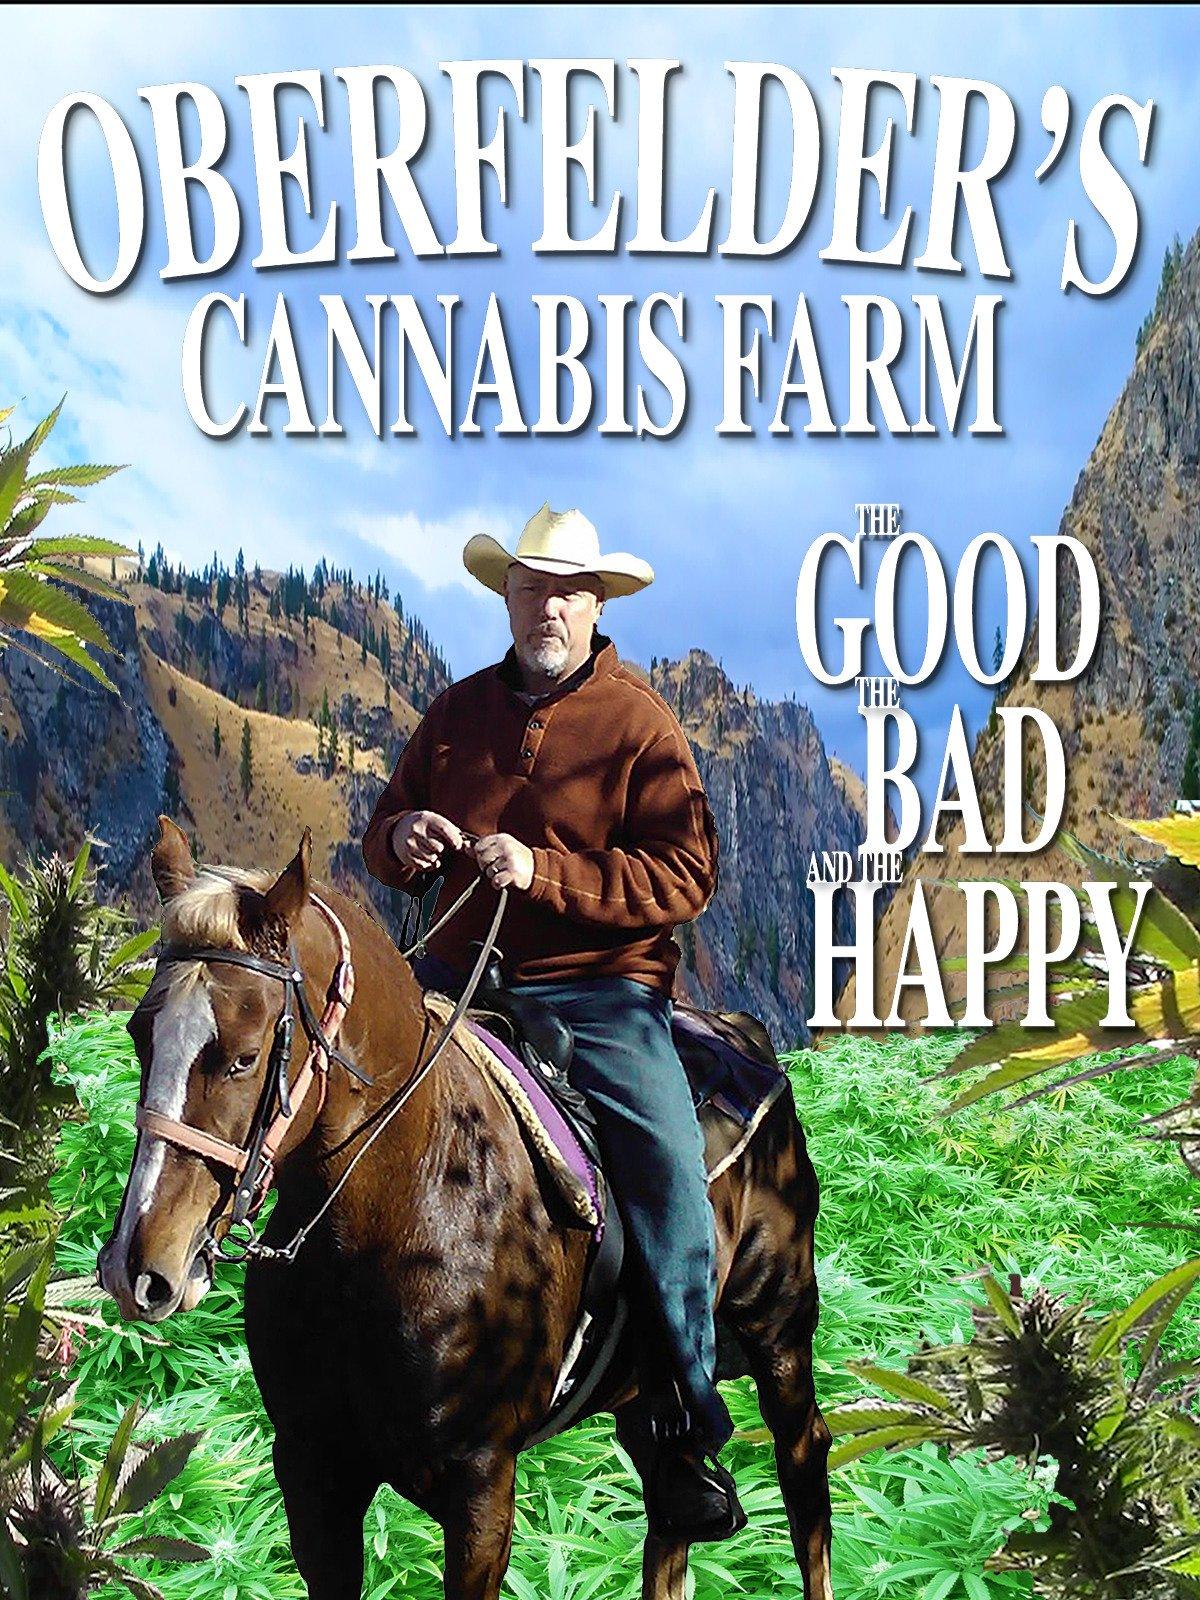 Oberfelders Cannabis Farm, The Good, The Bad, and The Happy